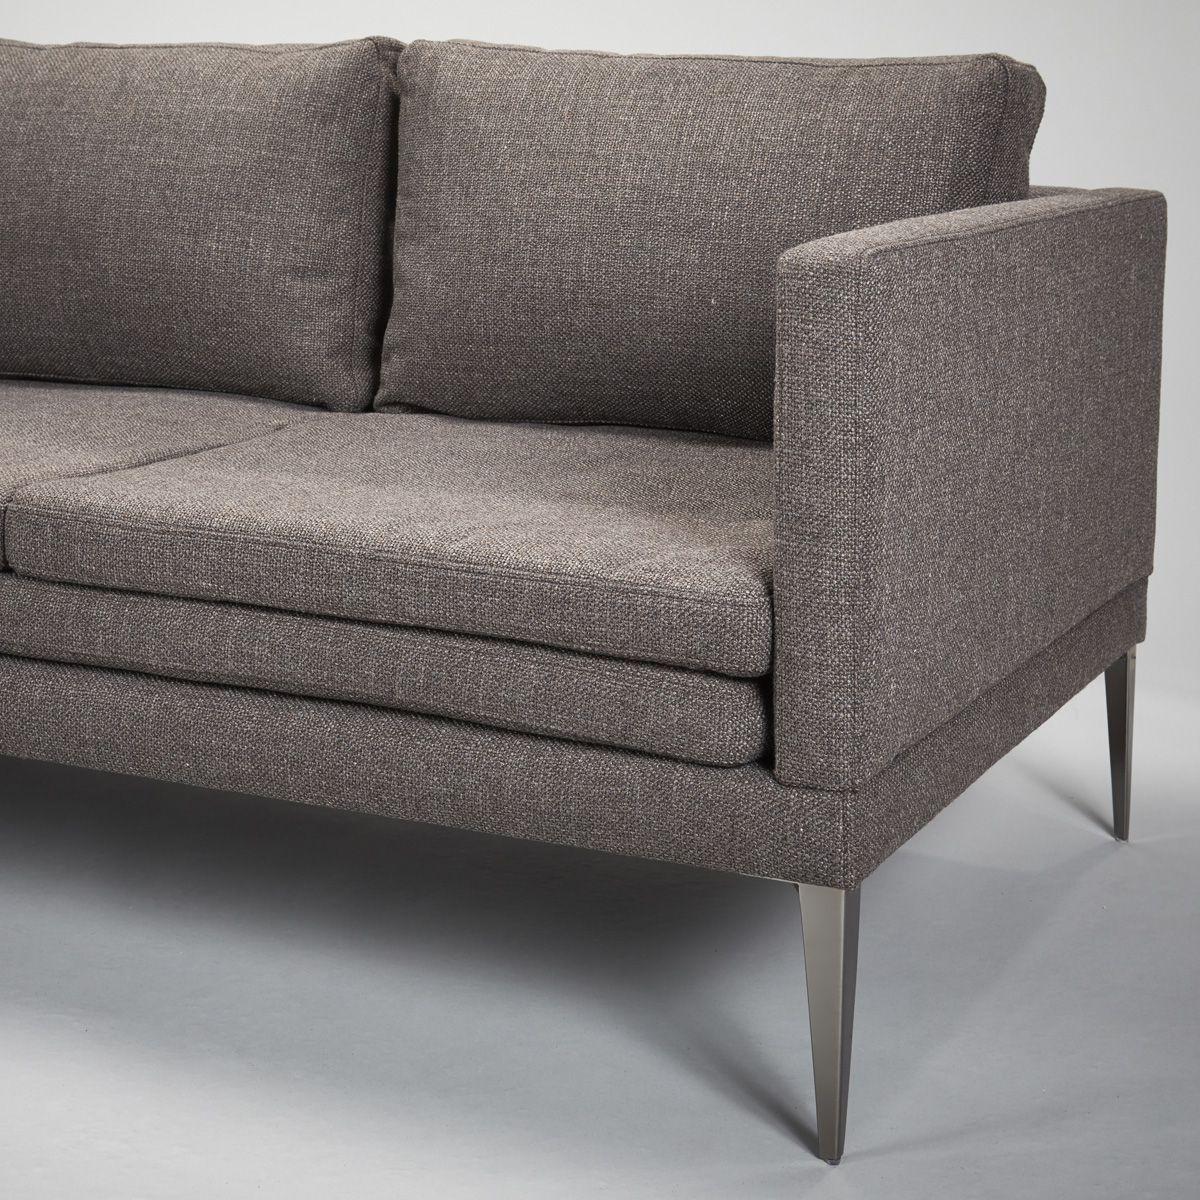 Robert.langford.london Pertaining To London Dark Grey Sofa Chairs (Gallery 17 of 20)